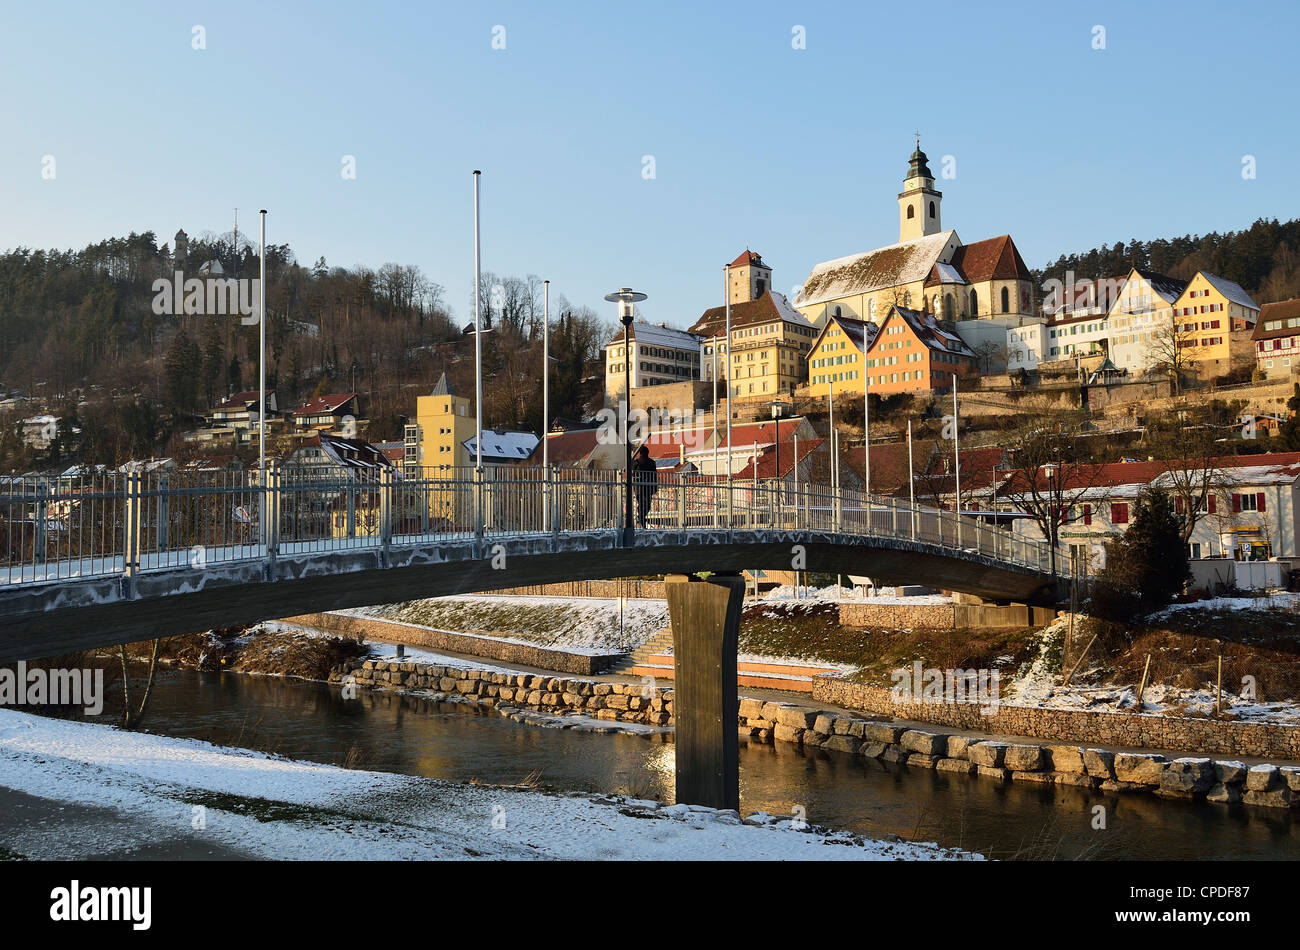 Old town of Horb and the frozen River Neckar, Neckartal (Neckar Valley), Baden-Wurttemberg, Germany, Europe - Stock Image